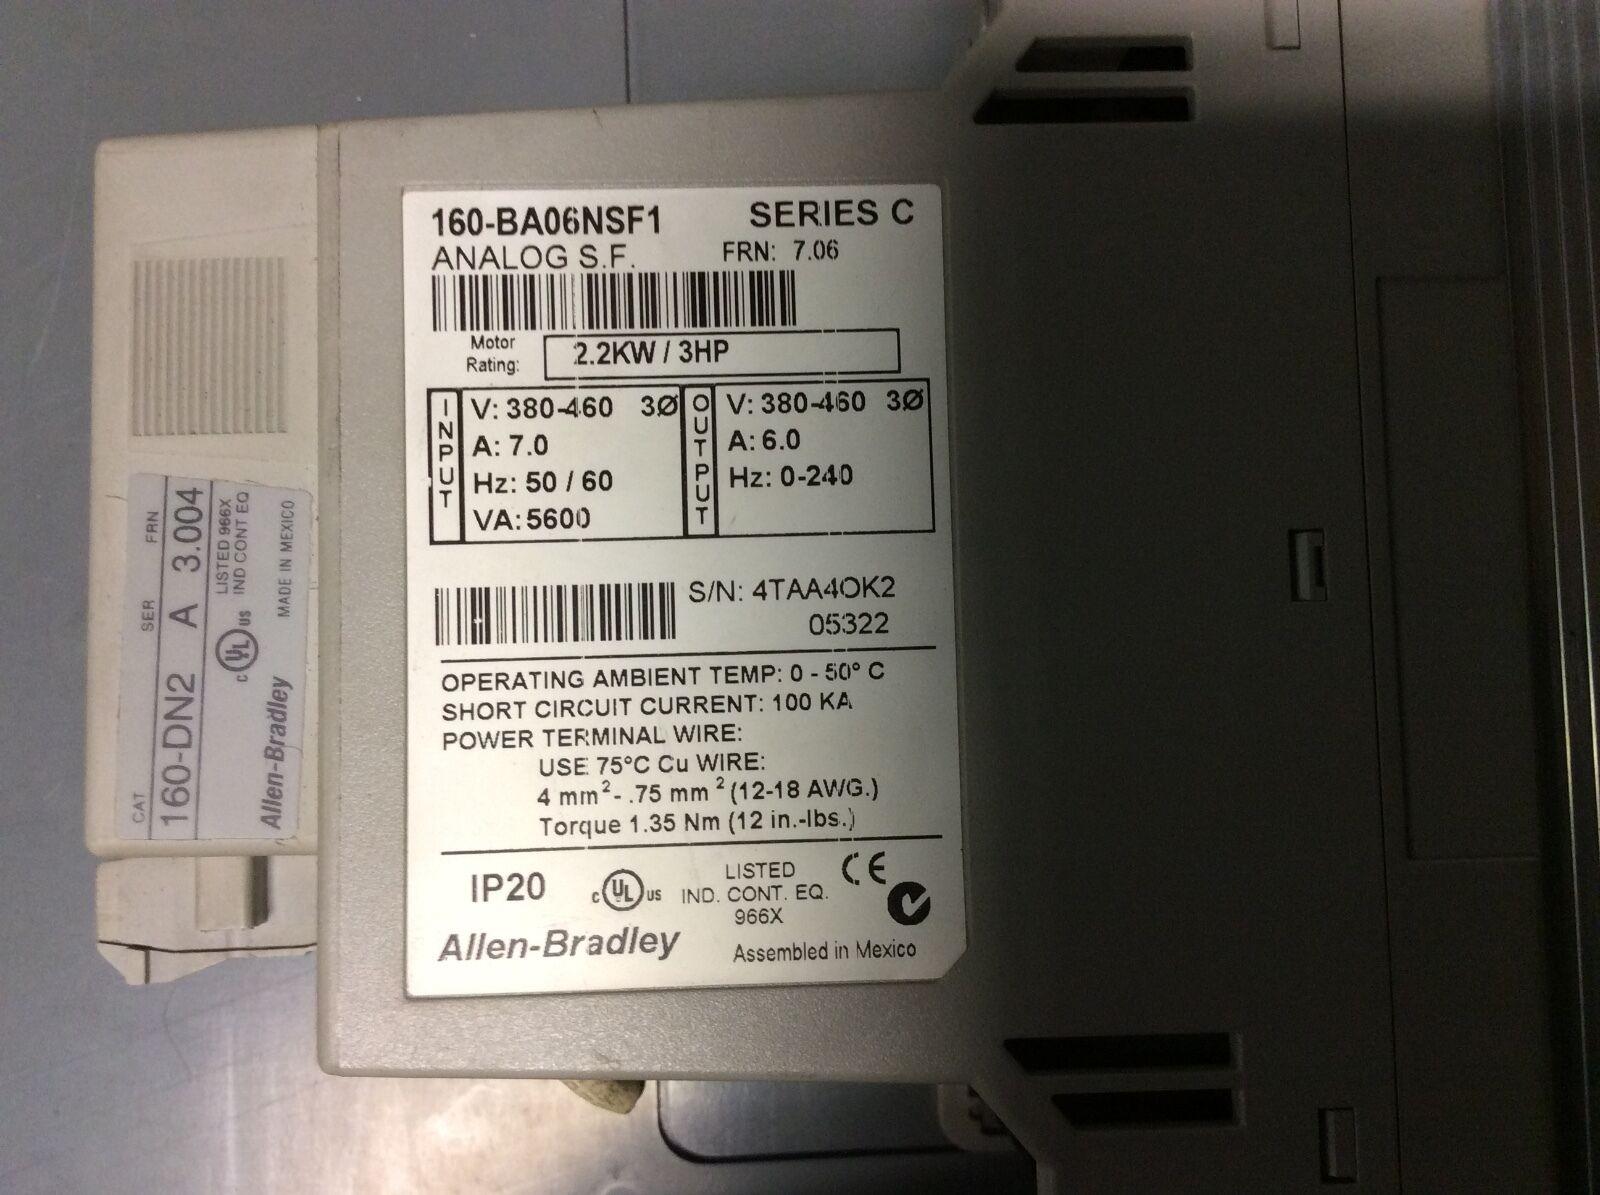 Allen-Bradley Unidad 3hp, 160-BA06NSF1, ser-C, frn-7.06, garantía garantía garantía de rojo de dispositivo 1a01d3